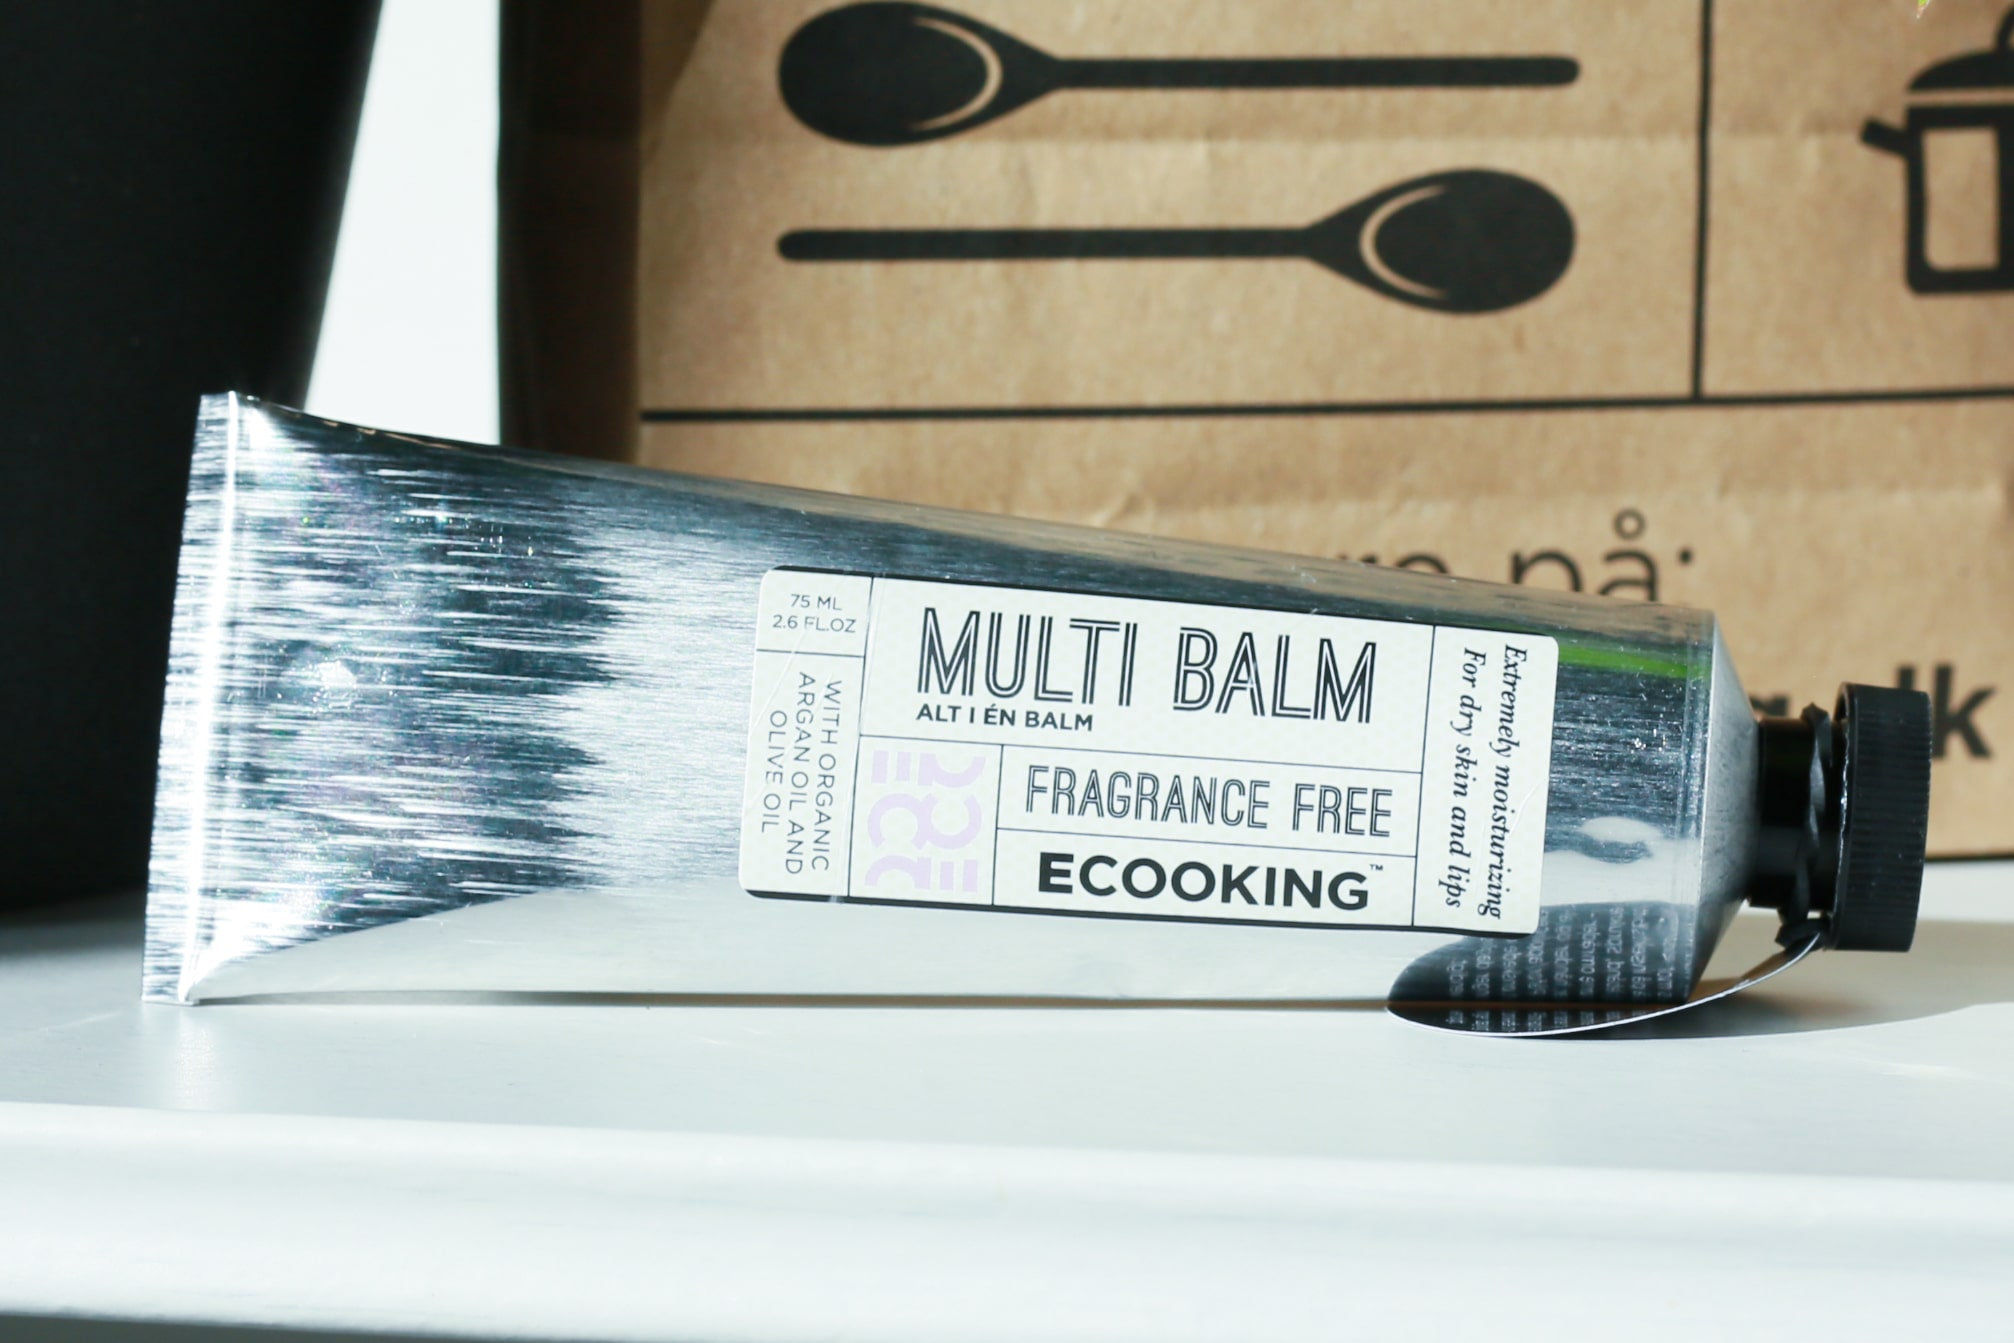 Ecooking multi balm